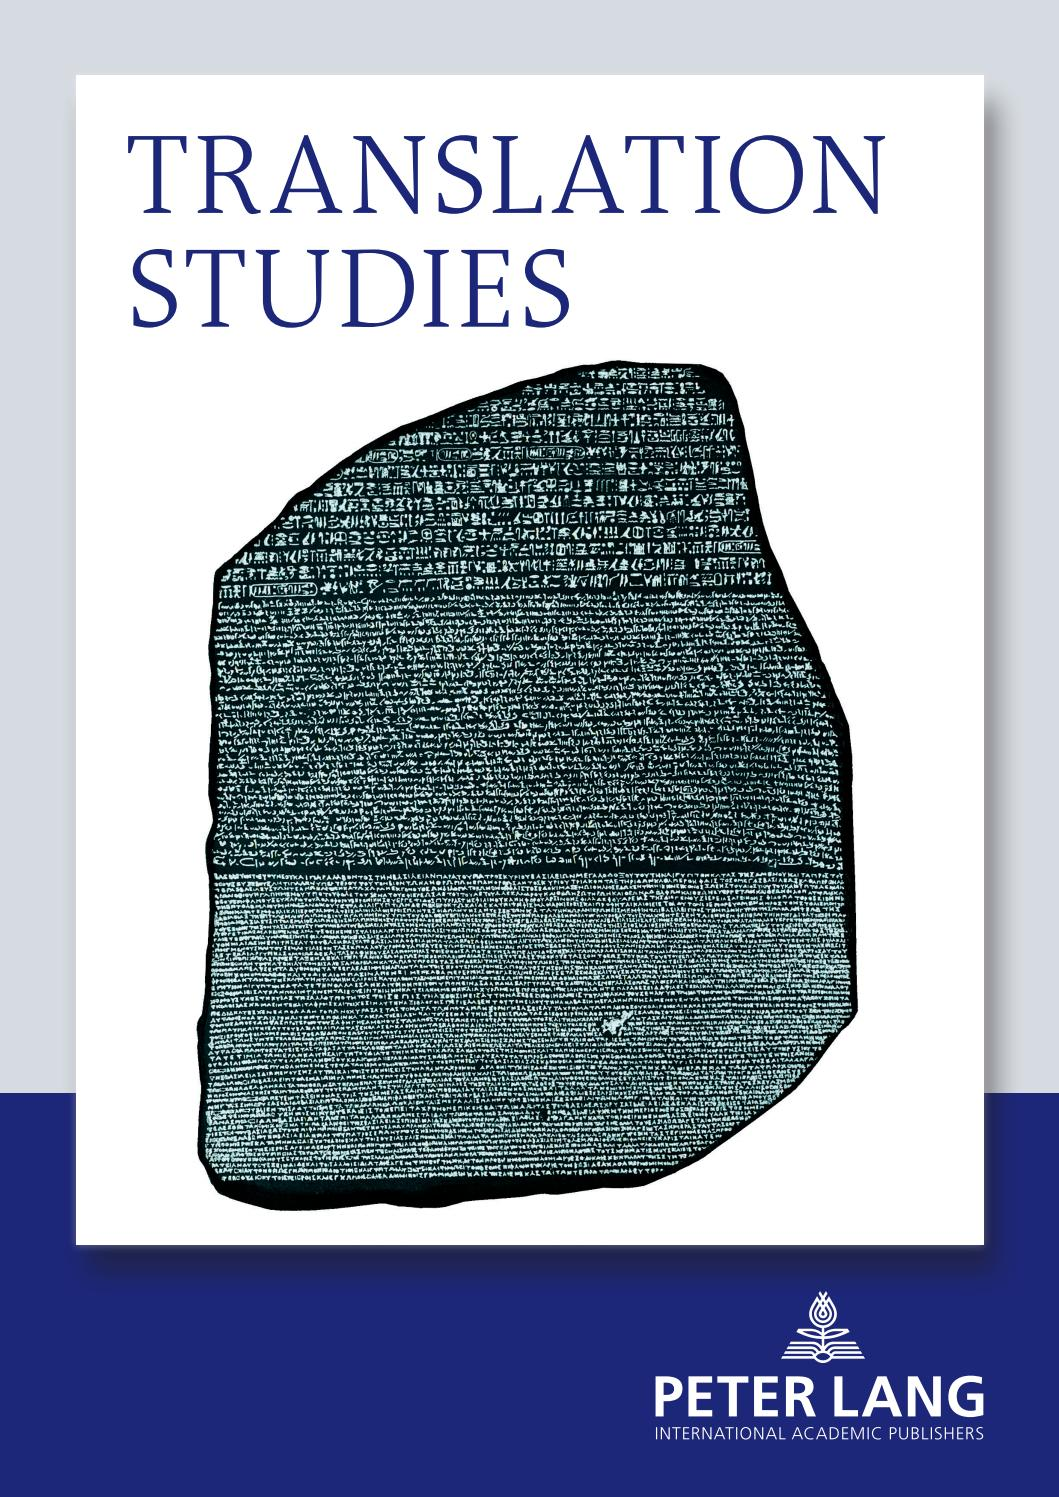 Translation Studies Catalogue 2016 By Peter Lang Publishing